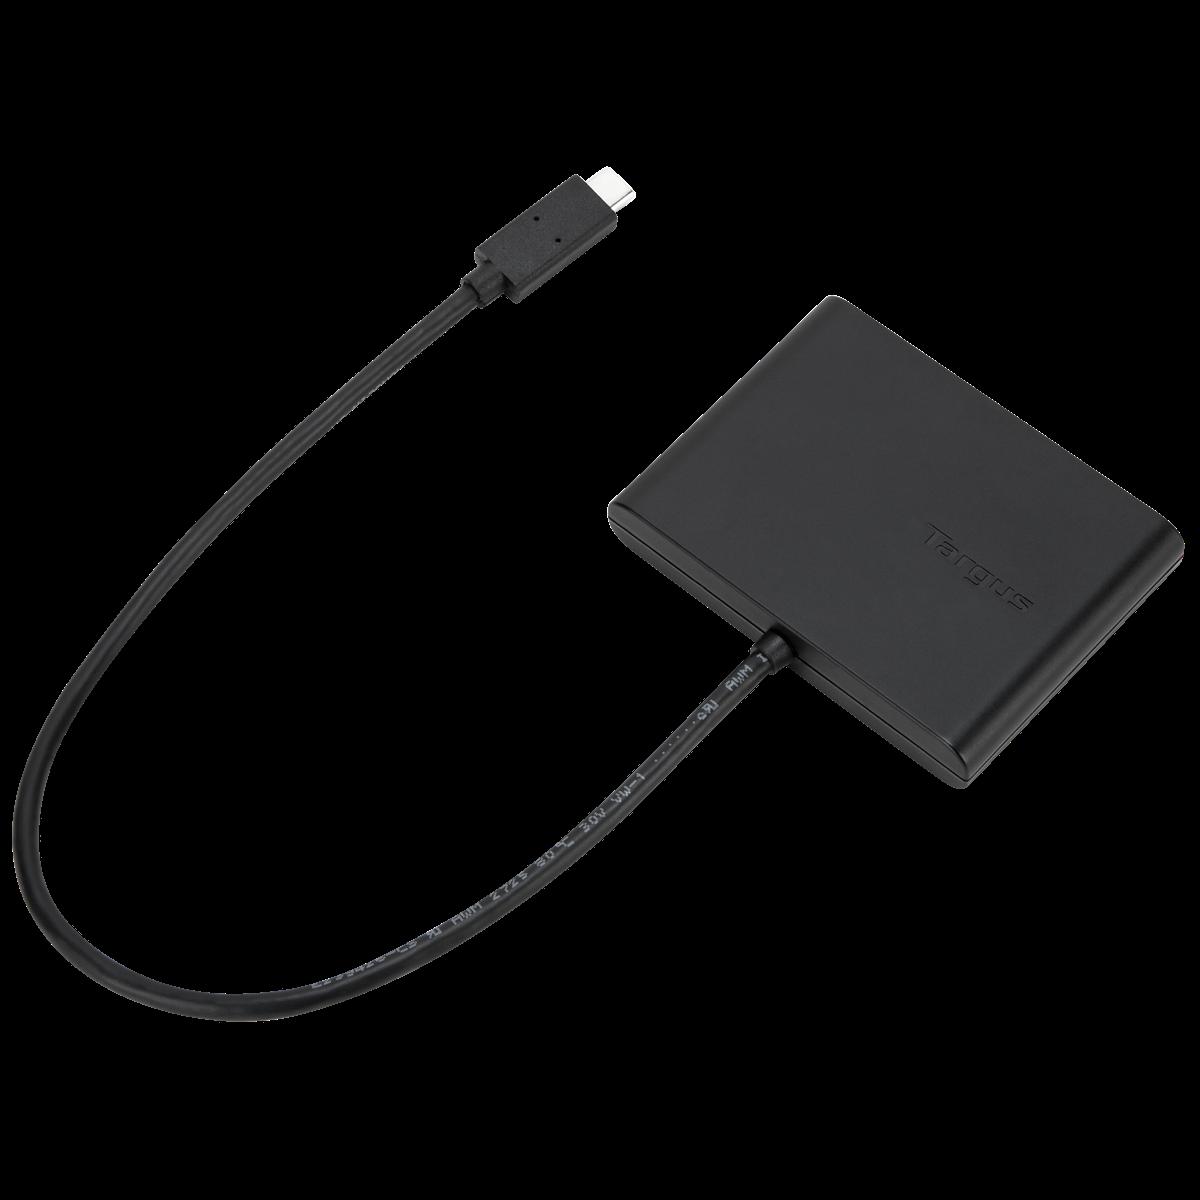 Picture of USB-C Digital AV Multiport Adapter